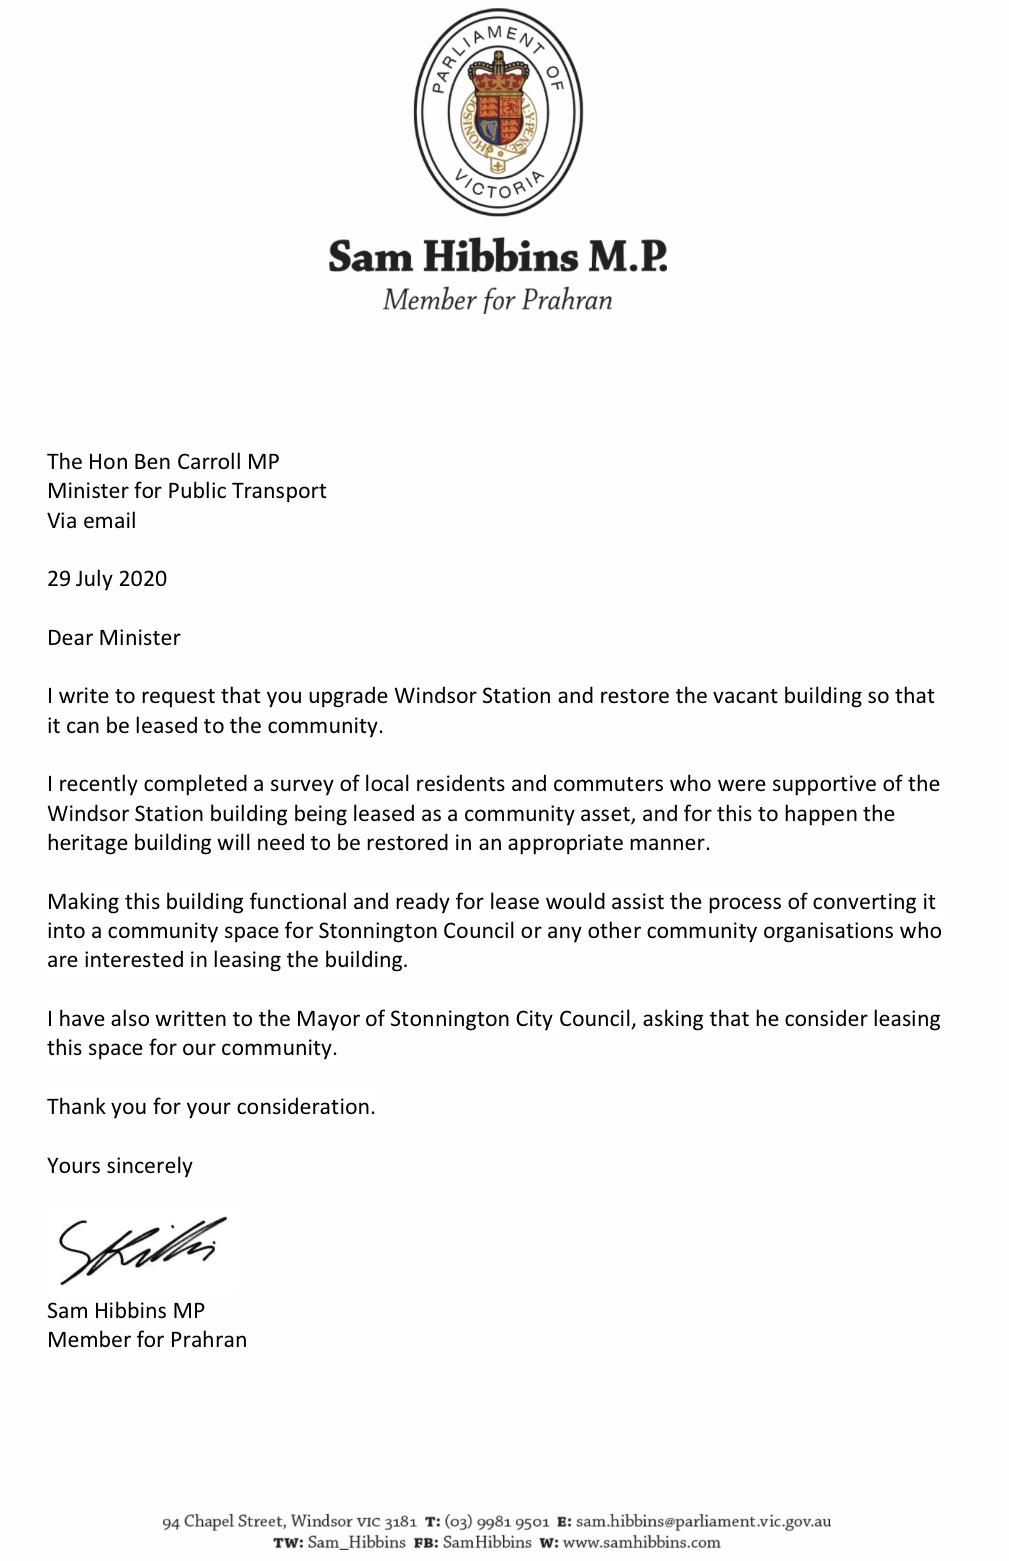 Letter to Minister for Public Transport.jpeg